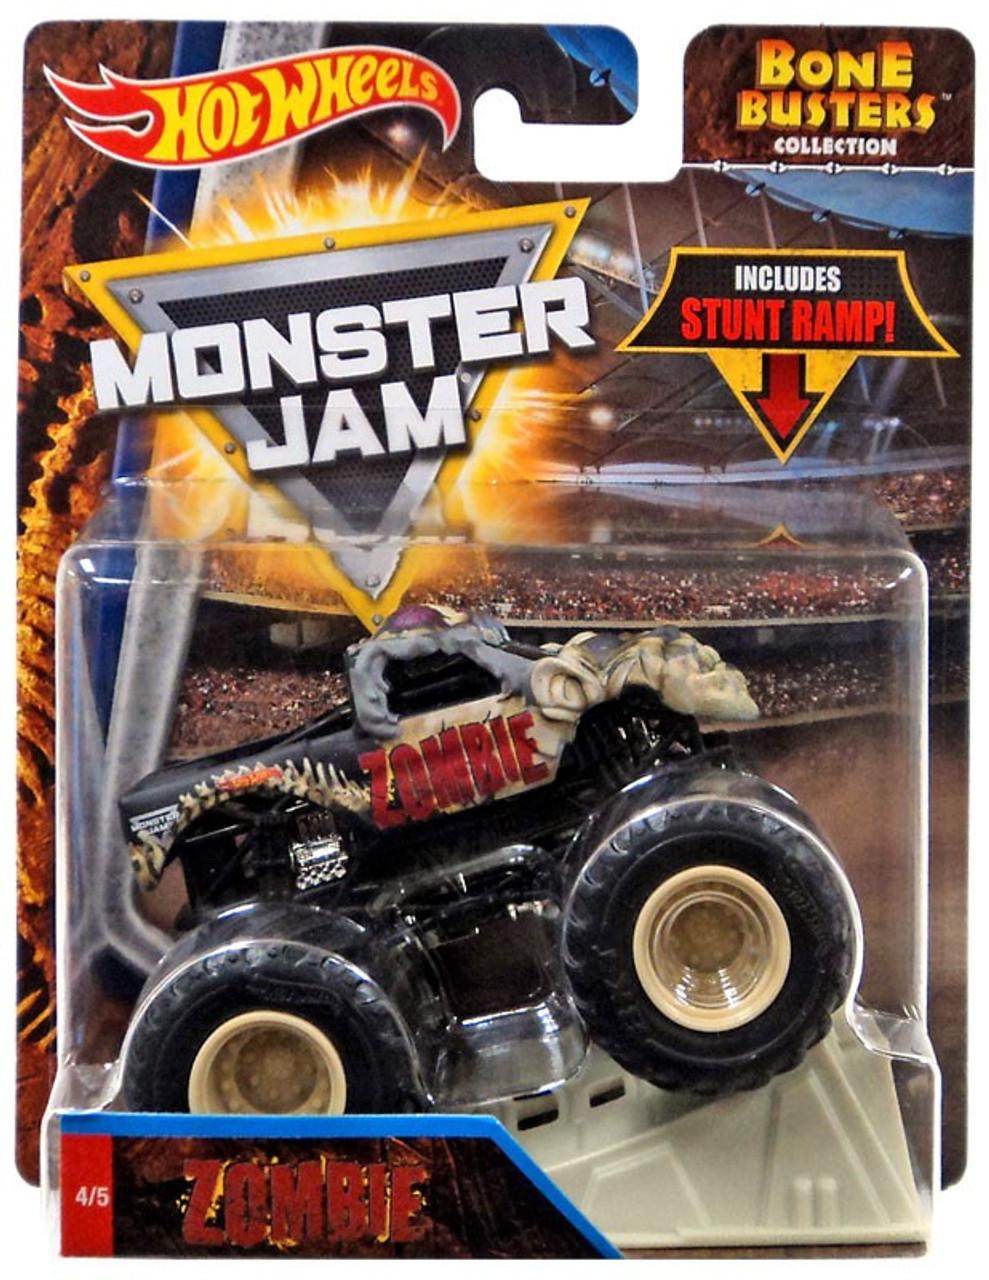 Hot Wheels Monster Jam Bone Busters Zombie 164 Die Cast Car Mattel Toys Toywiz